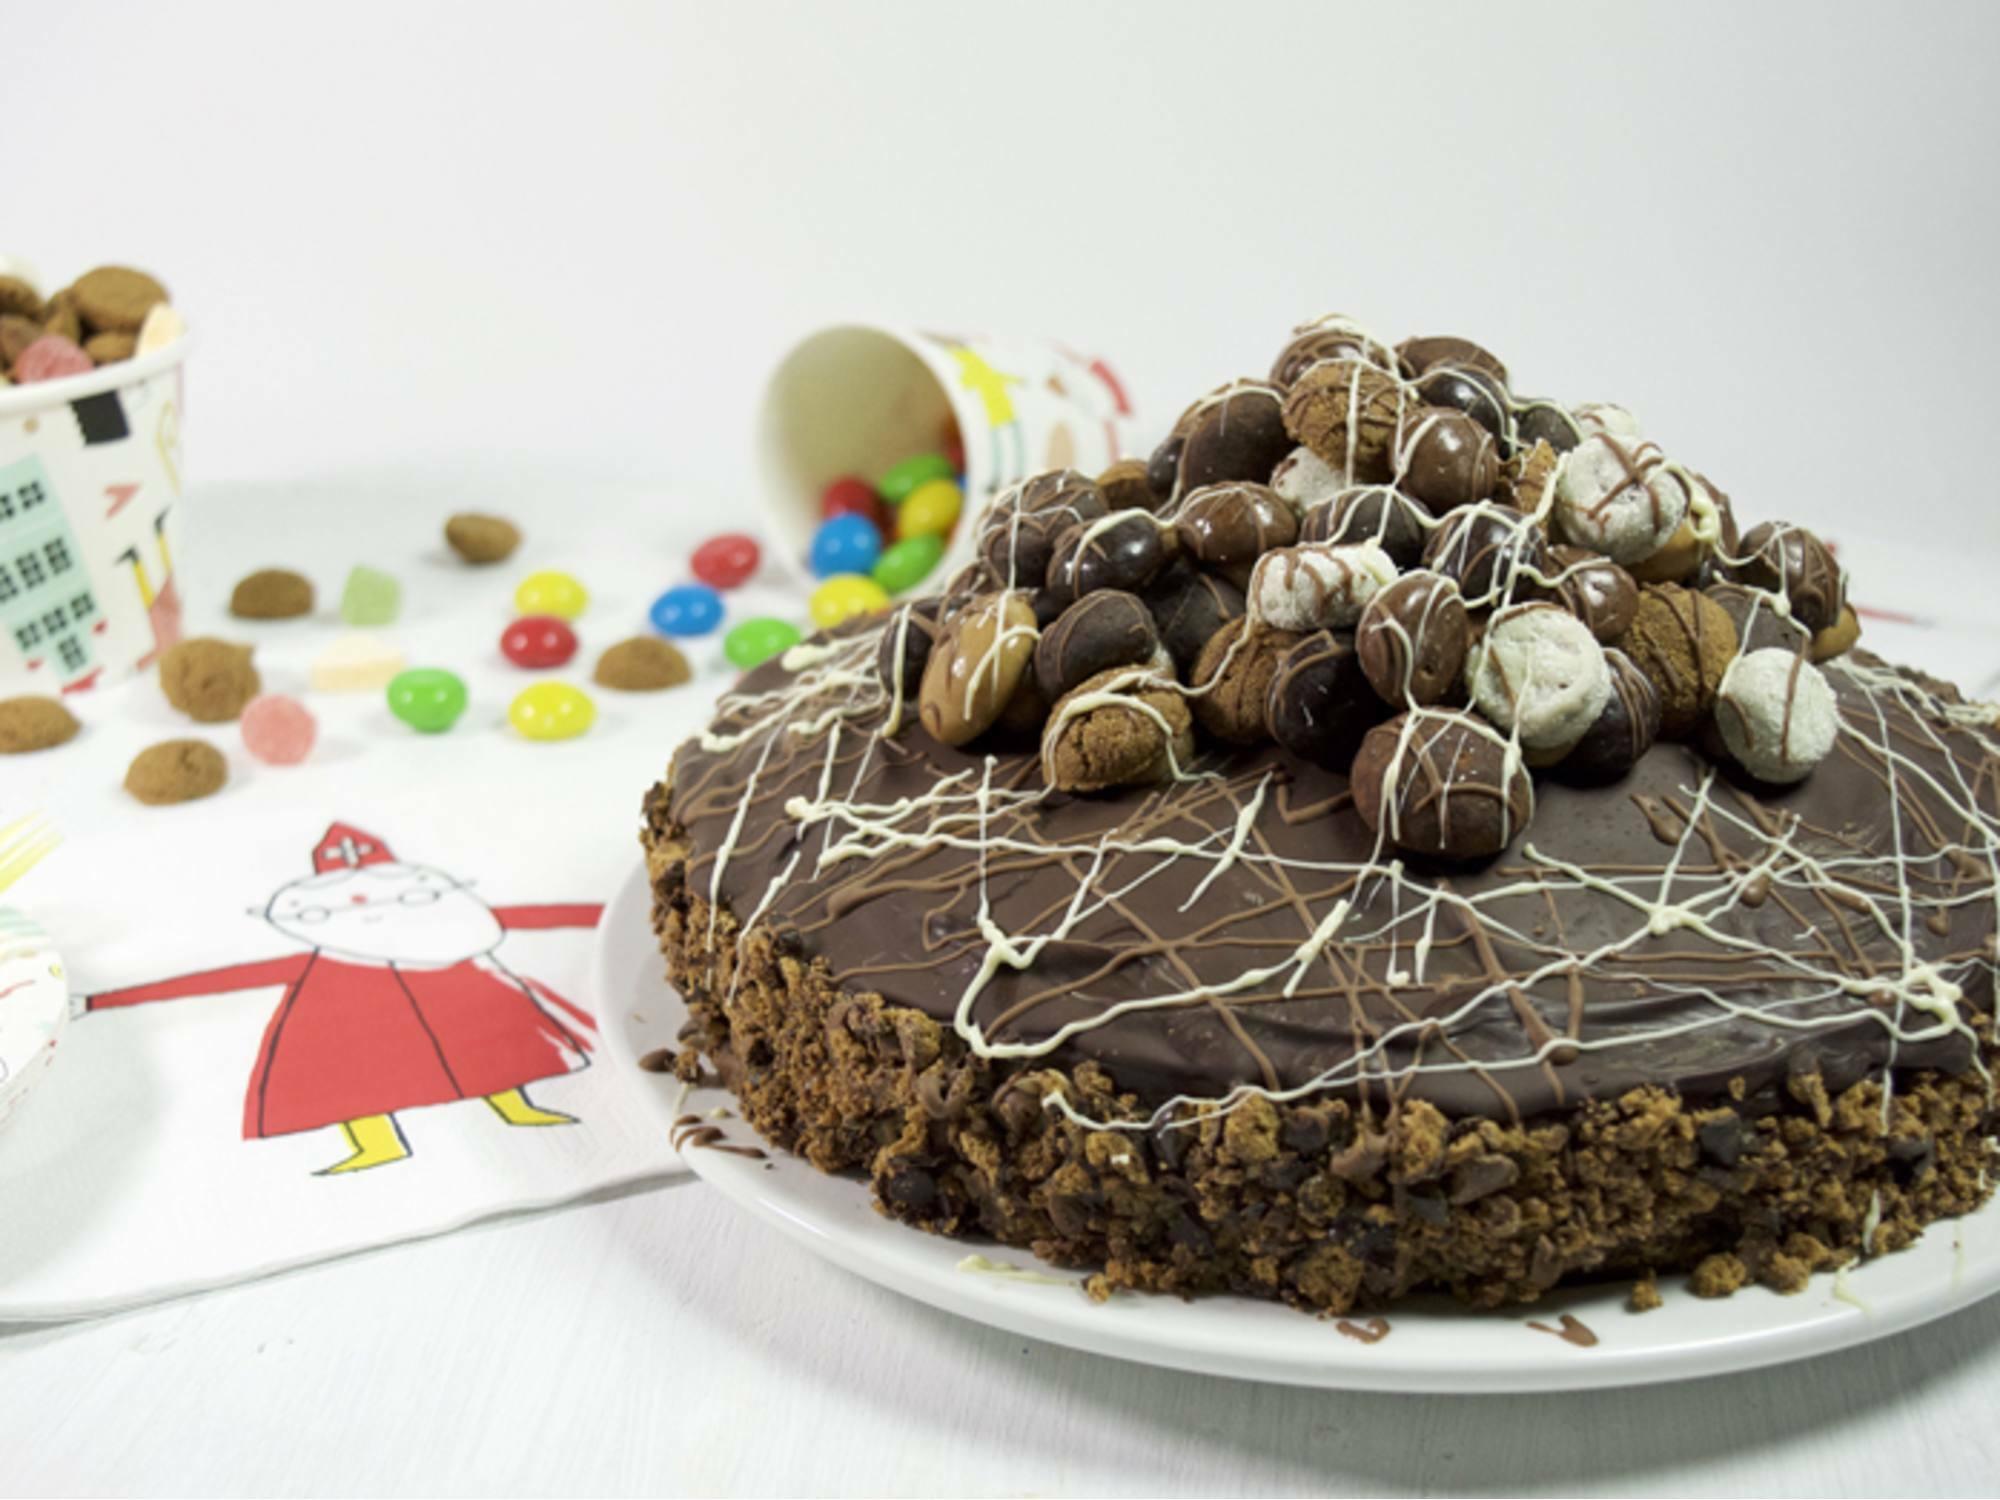 Sinterklaastaart met pindakaas en chocoladepepernoten